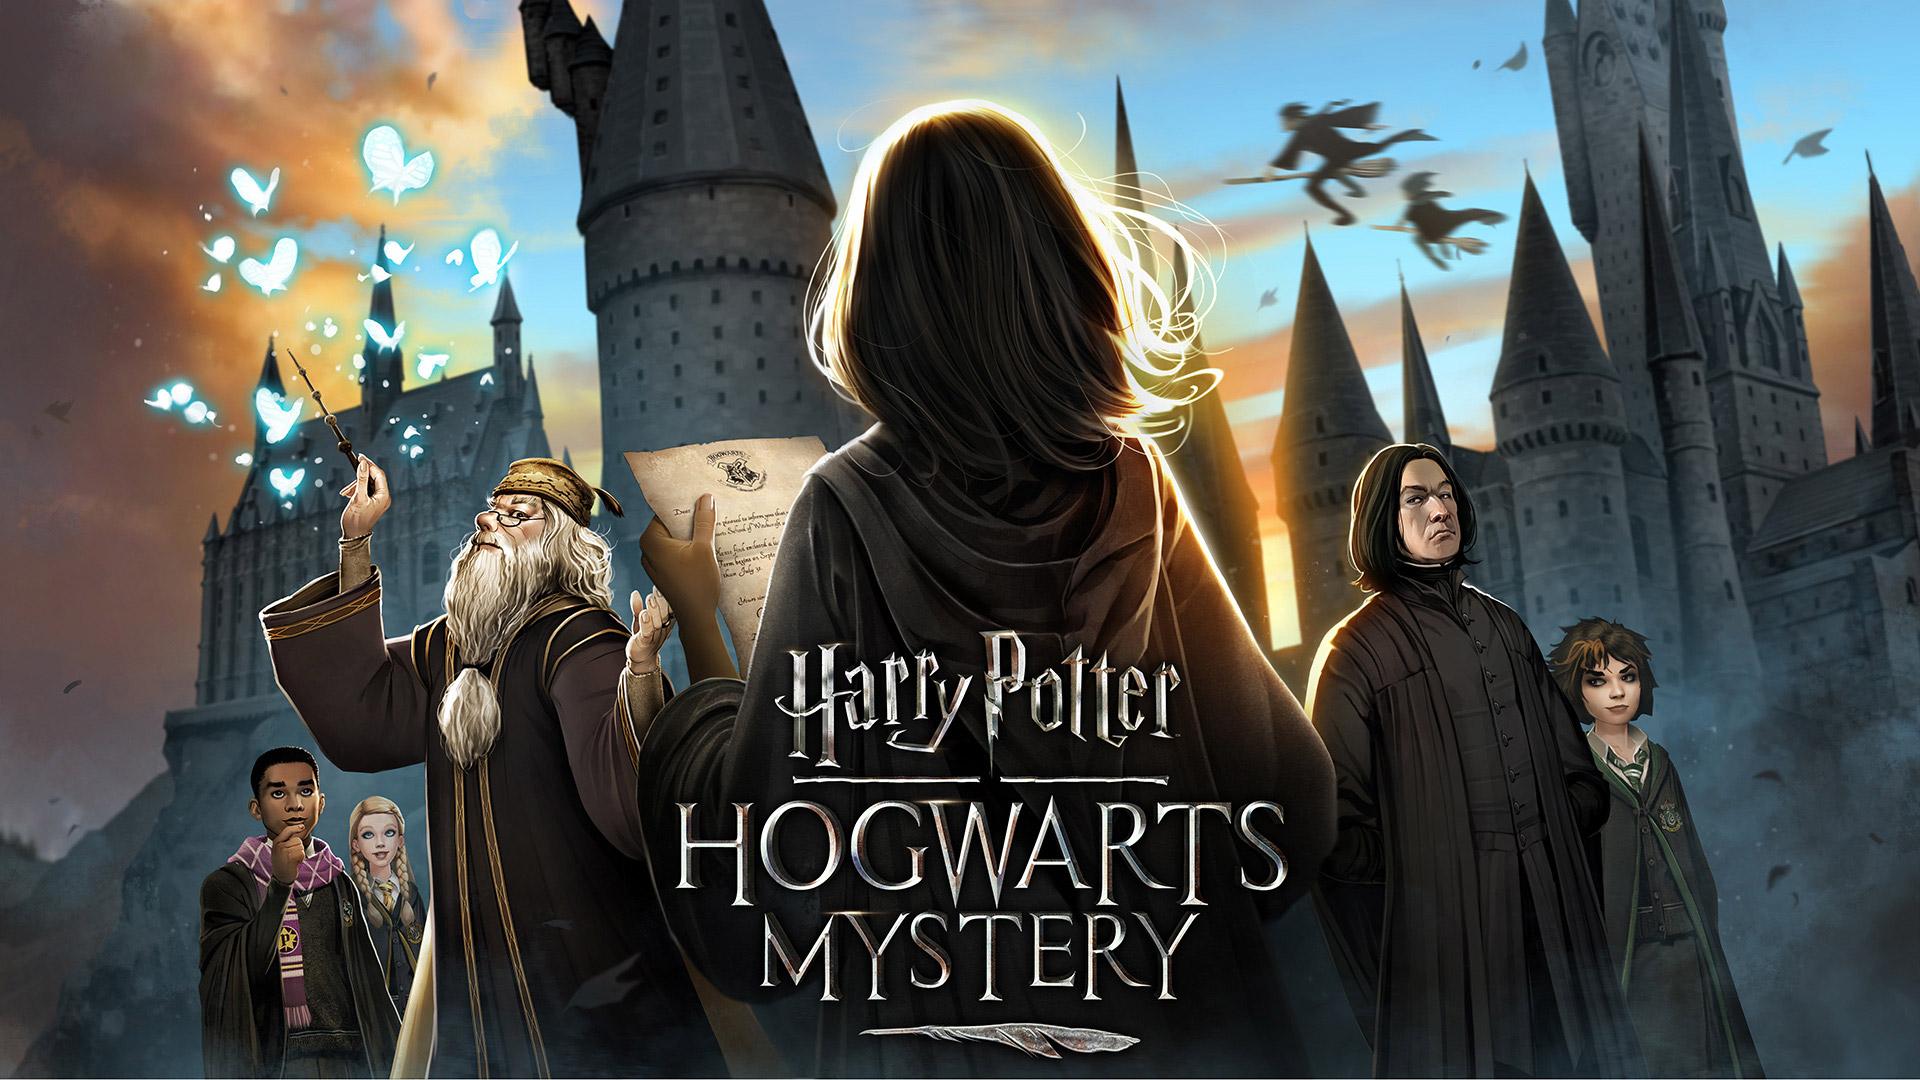 Free Harry Potter: Hogwarts Mystery Wallpaper in 1920x1080